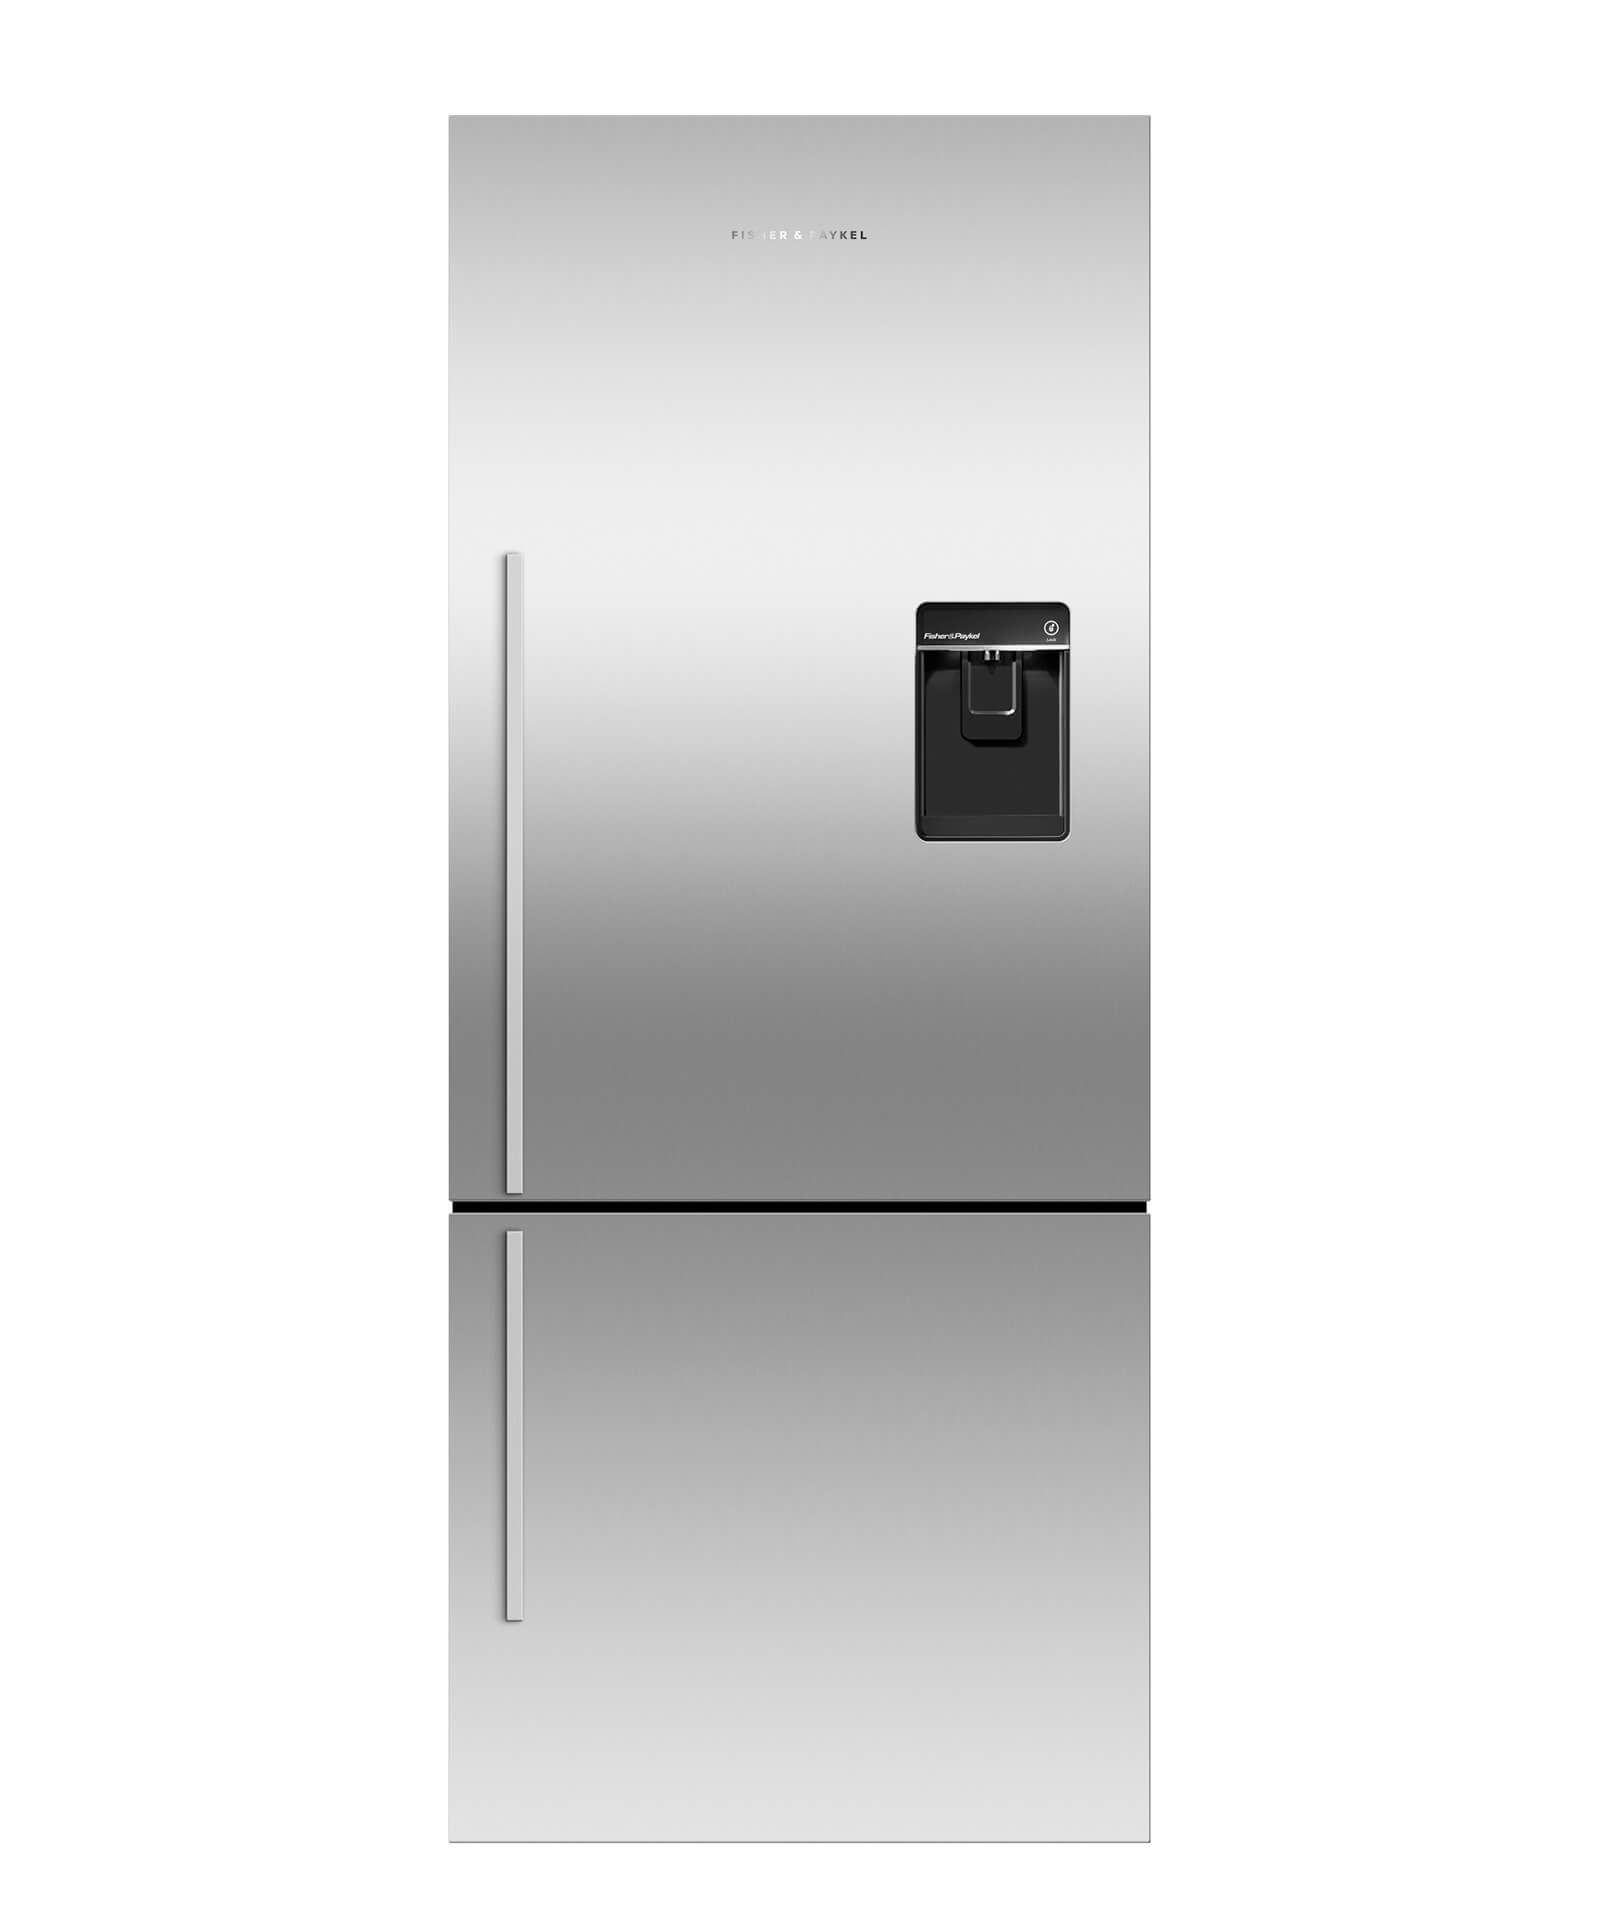 E442brxfdu5 Activesmart Fridge 680mm Bottom Freezer With Ice Water 442l 25349 Bottom Freezer Fridge Freezer